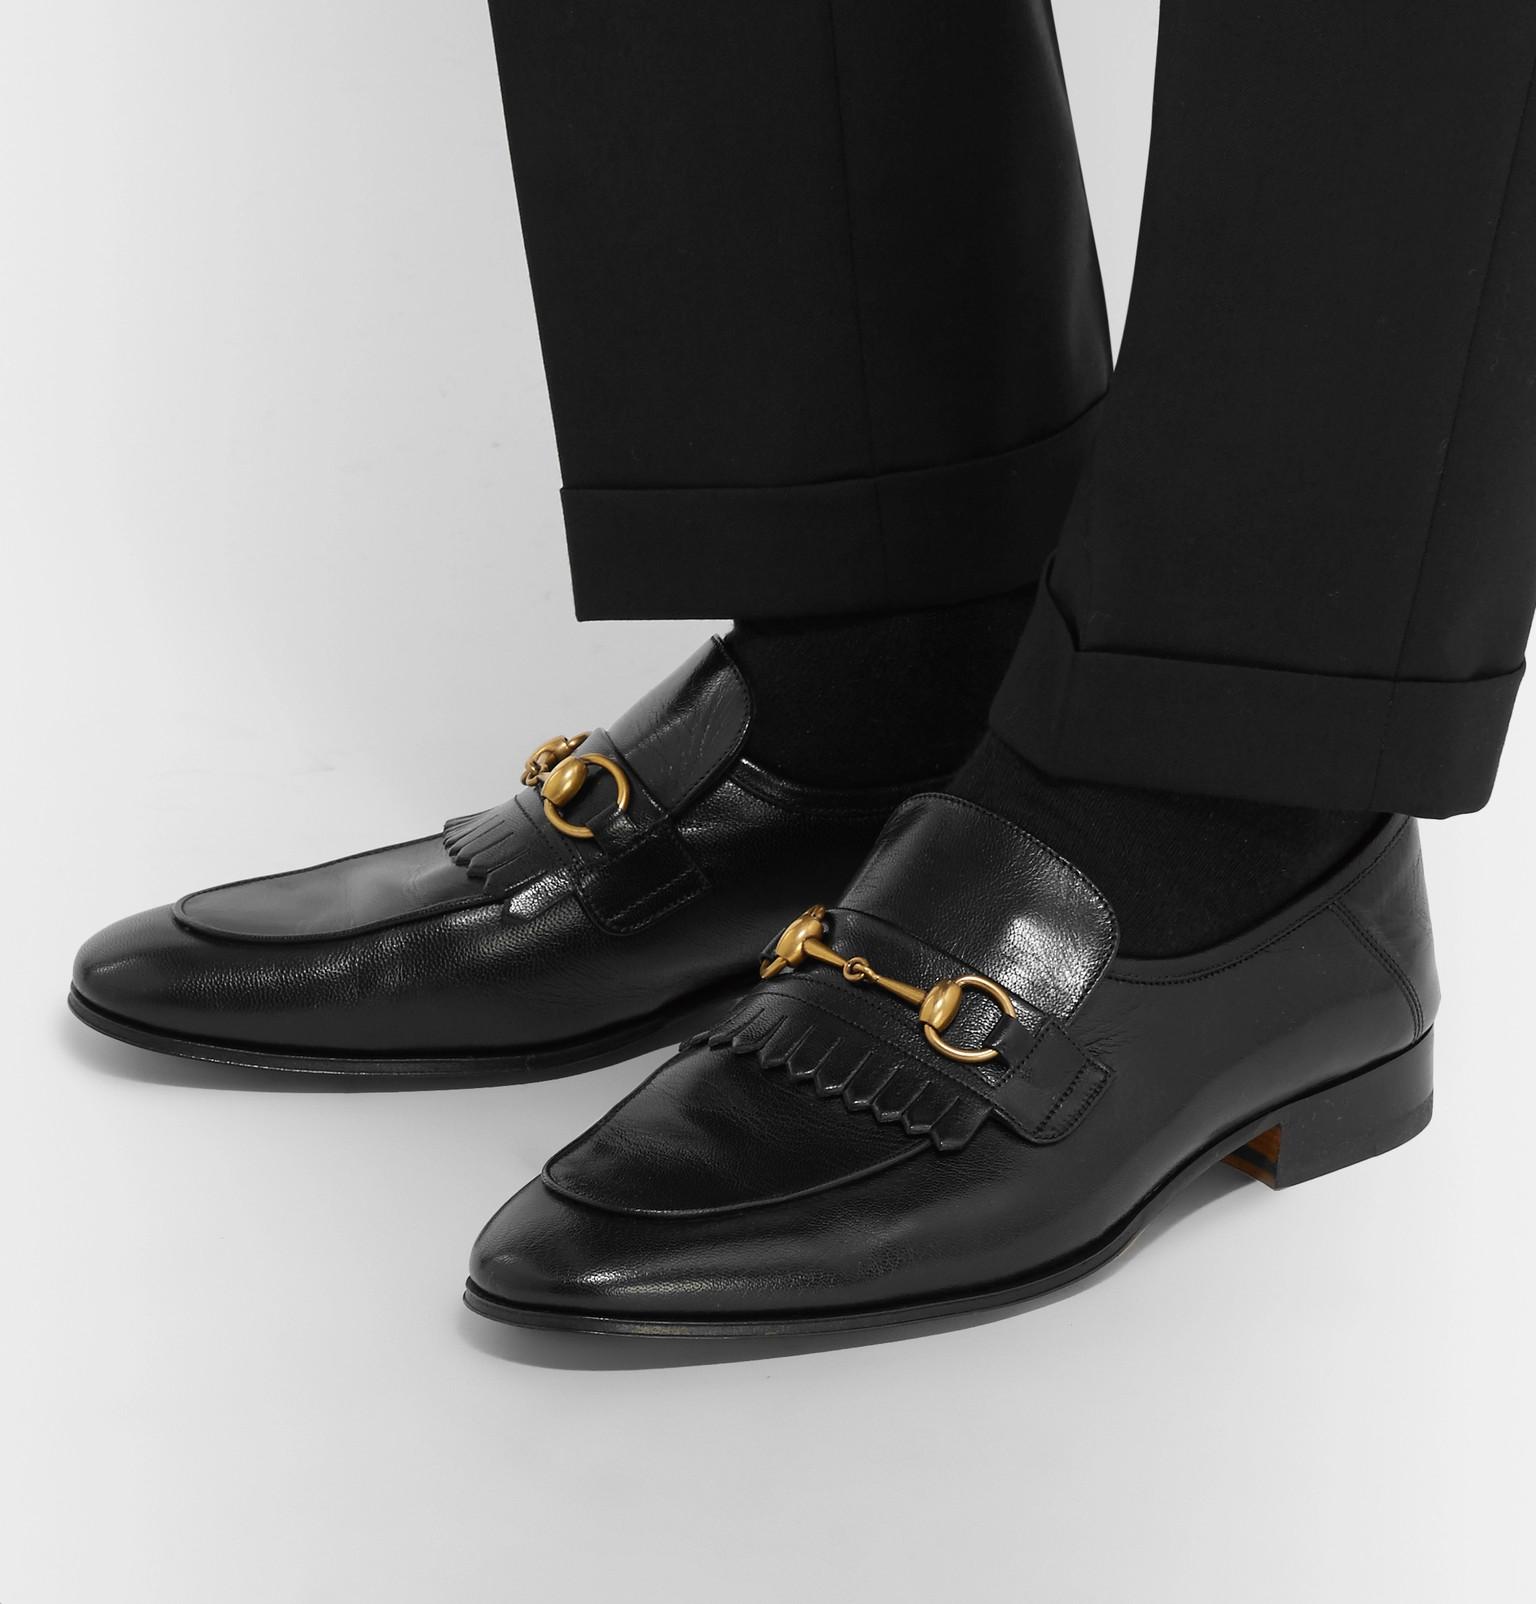 2da70510fb6 Gucci - Harbor Horsebit Fringed Leather Loafers